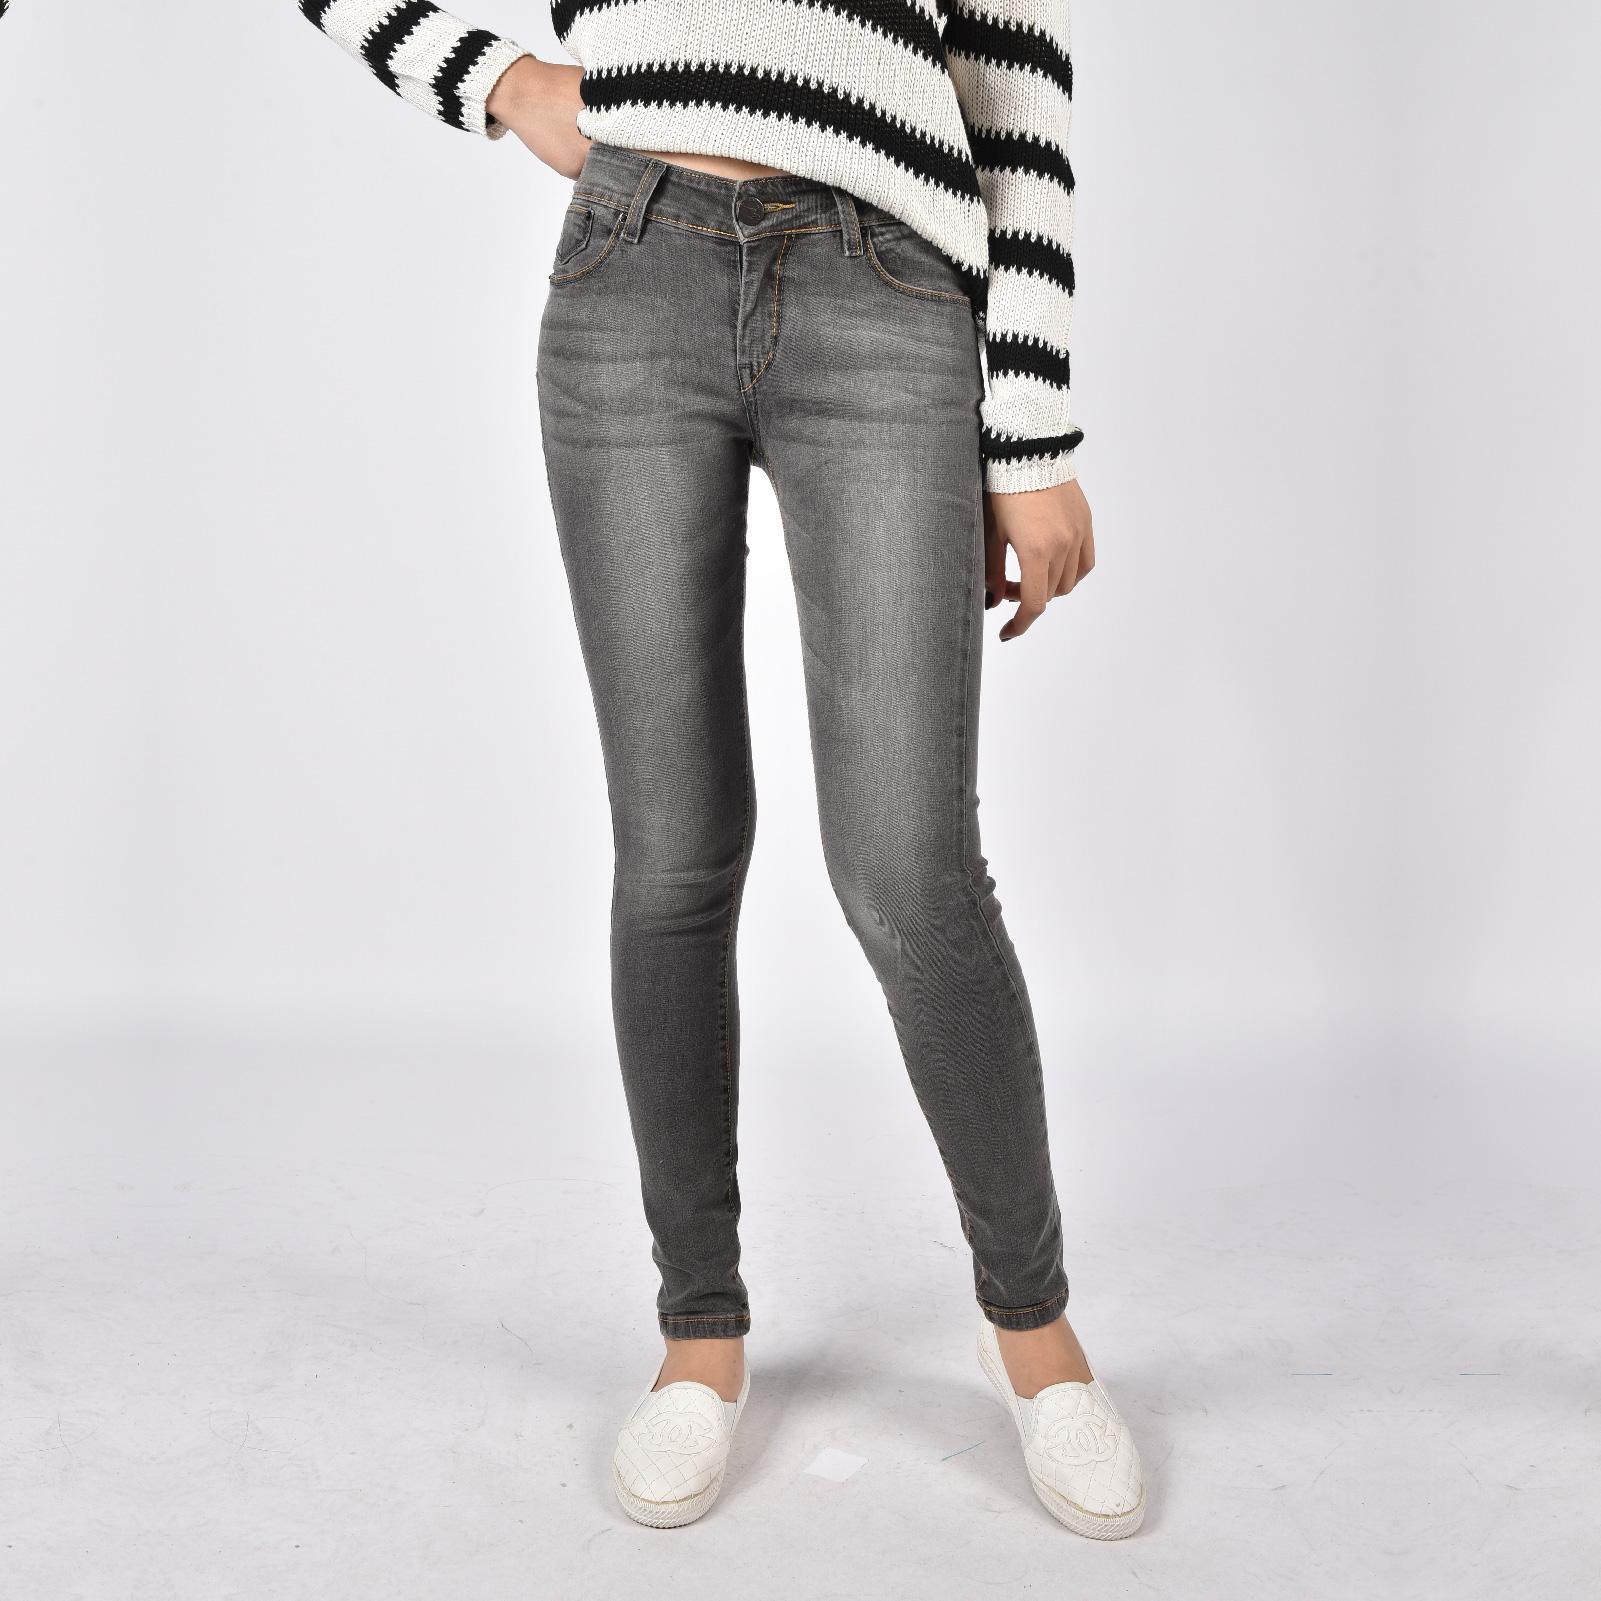 Quần jeans WINNY - WCJ20016